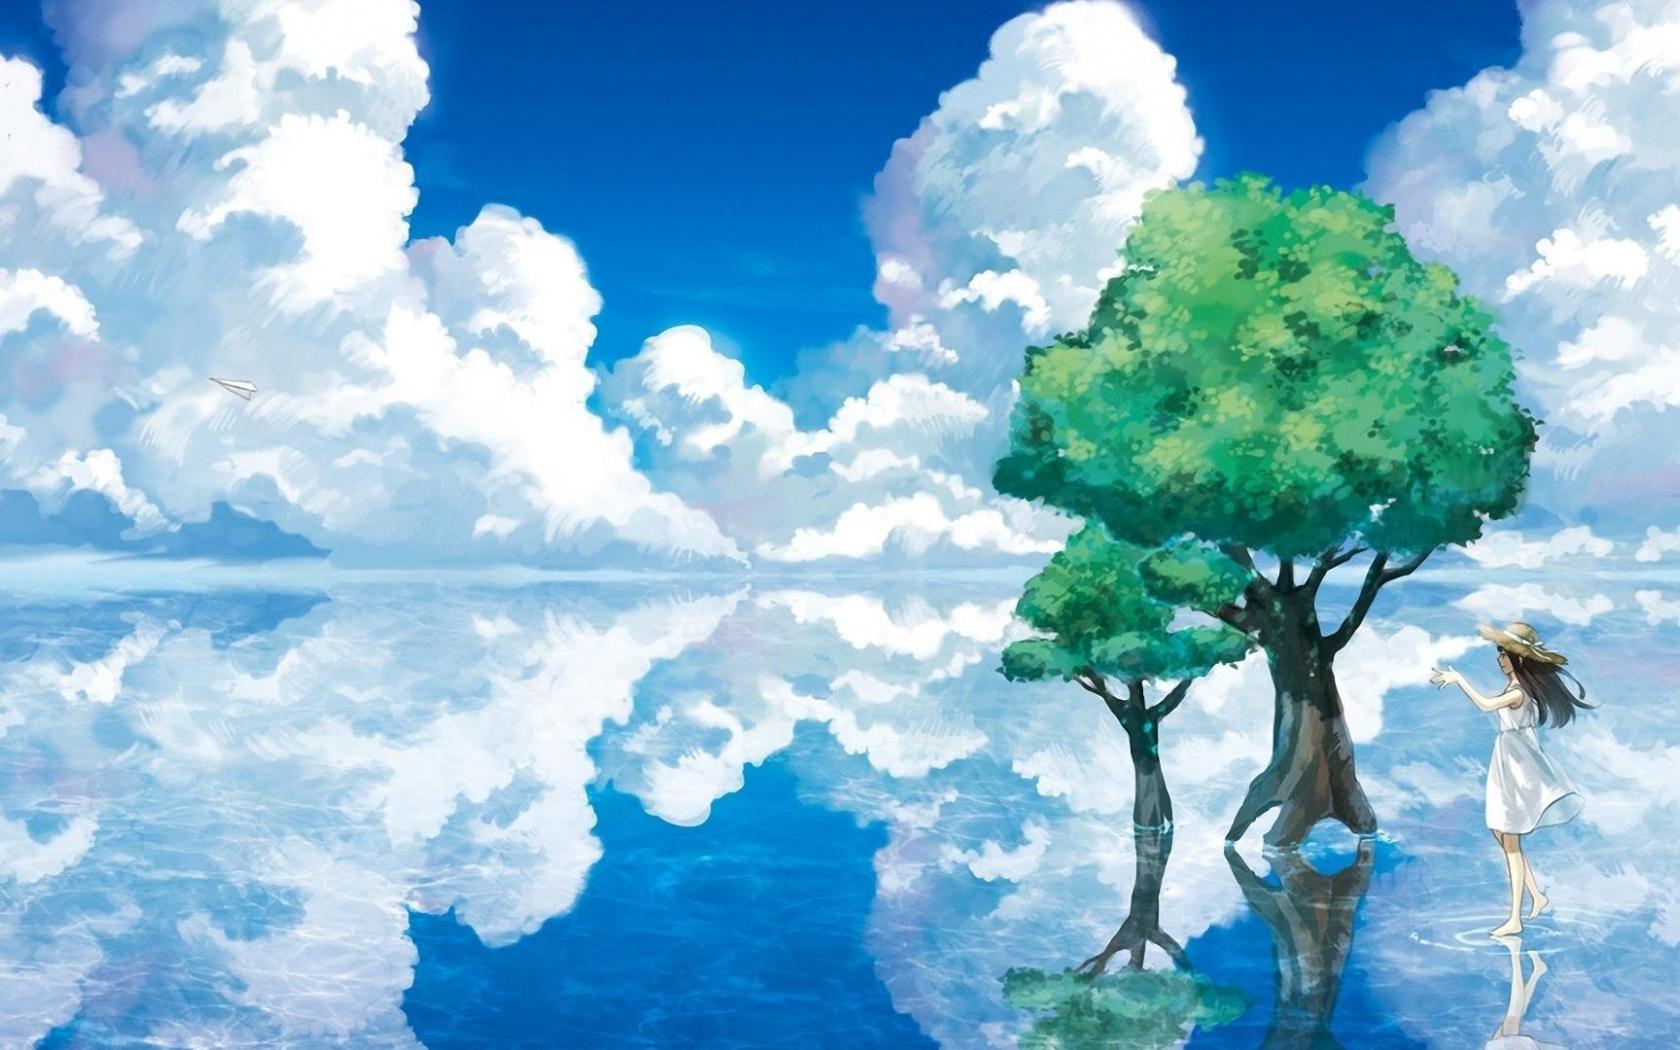 Free download Anime Wallpaper 1920x1080 ...